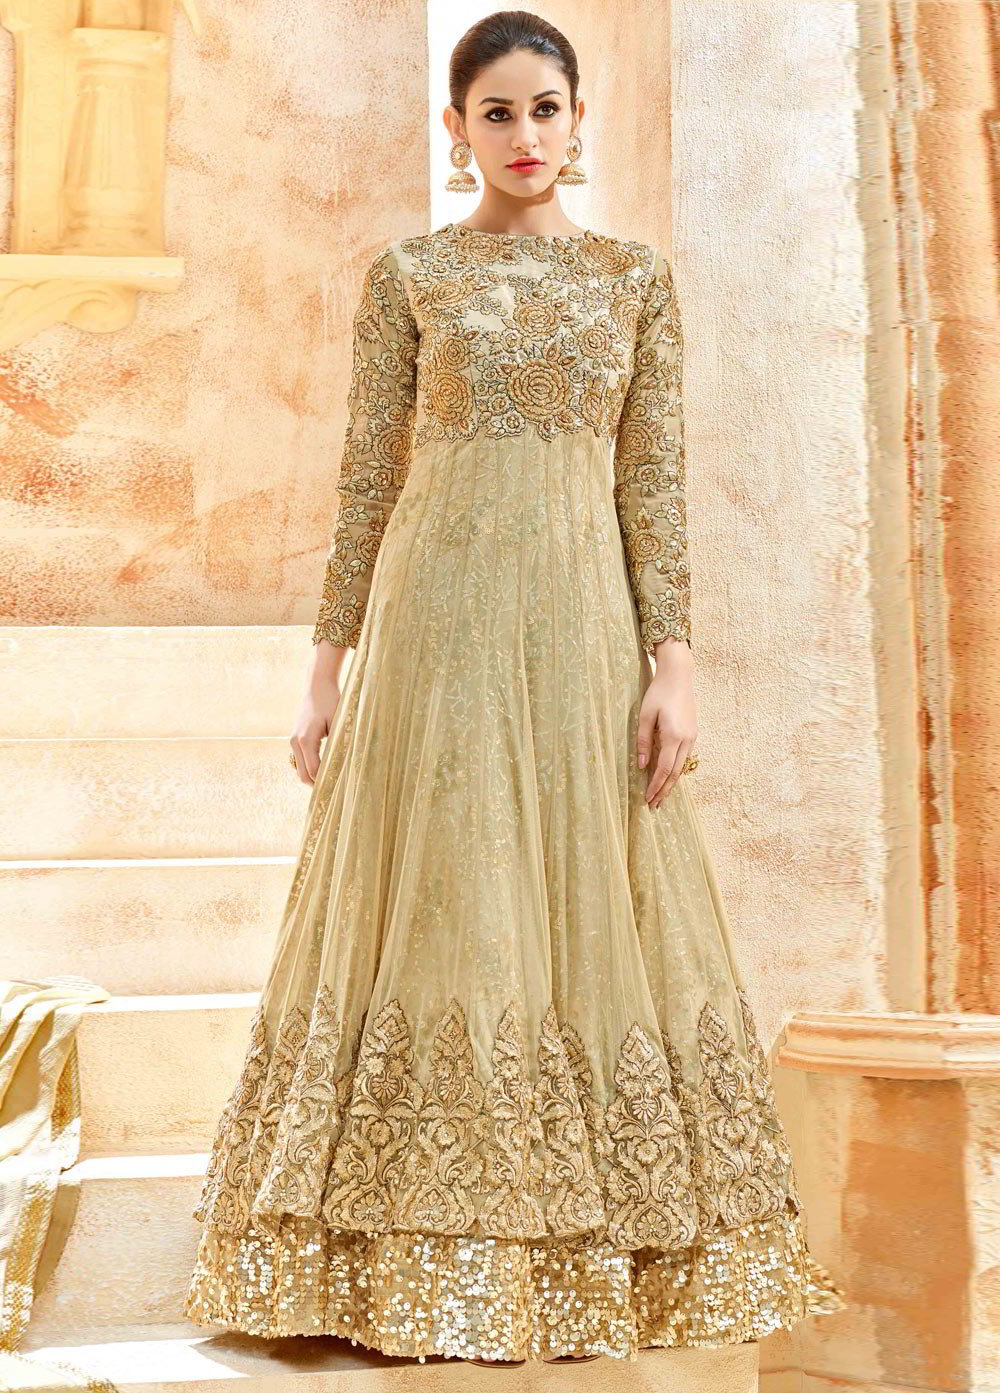 Beautiful Bridal Engagement Dresses 2018 In Pakistan Styleglow Com